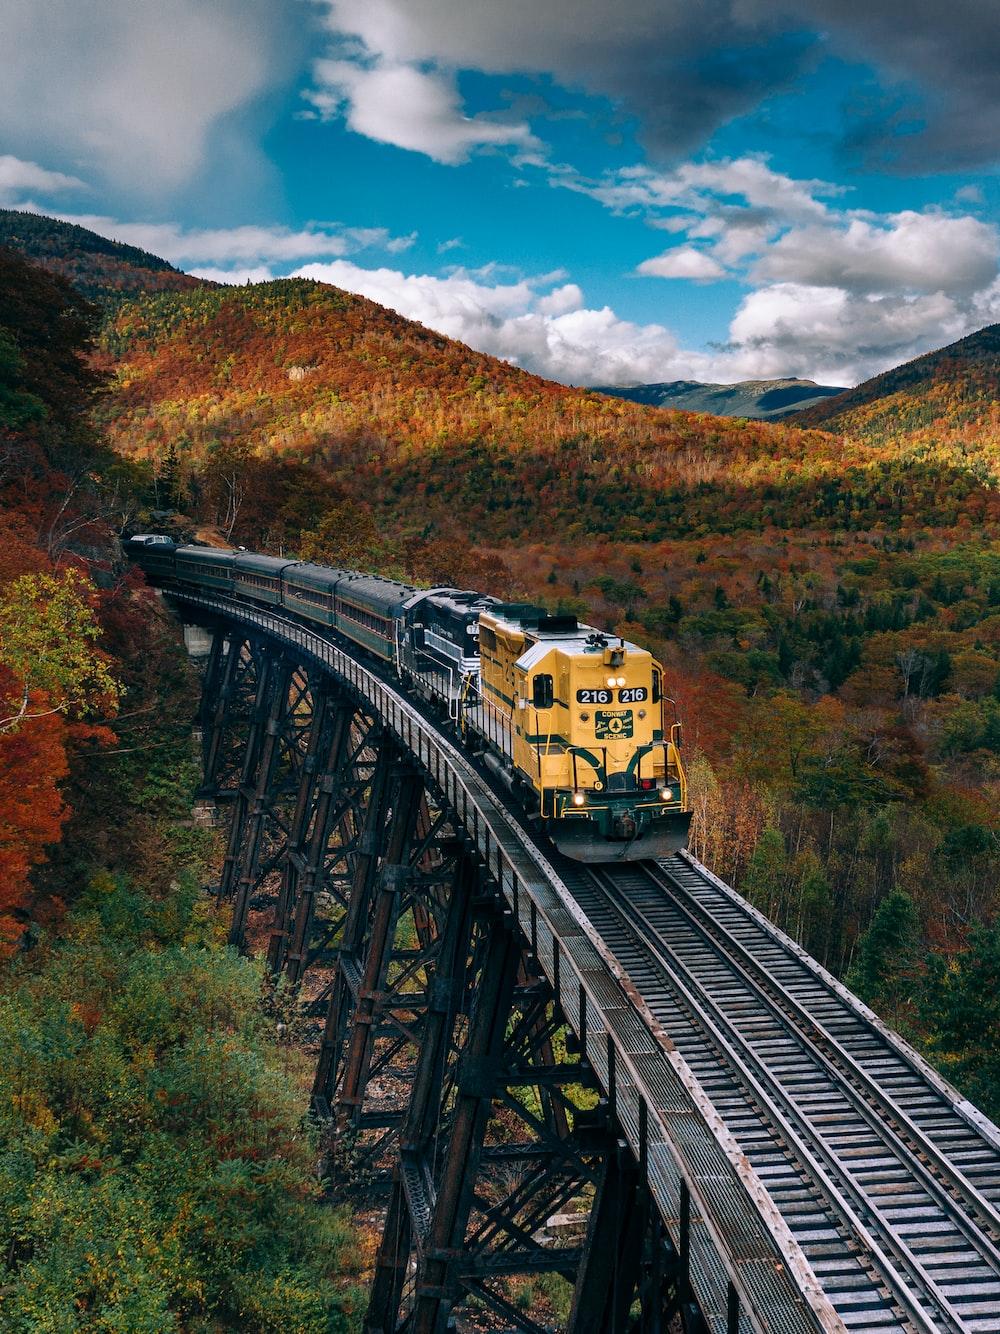 yellow train on rail tracks during daytime